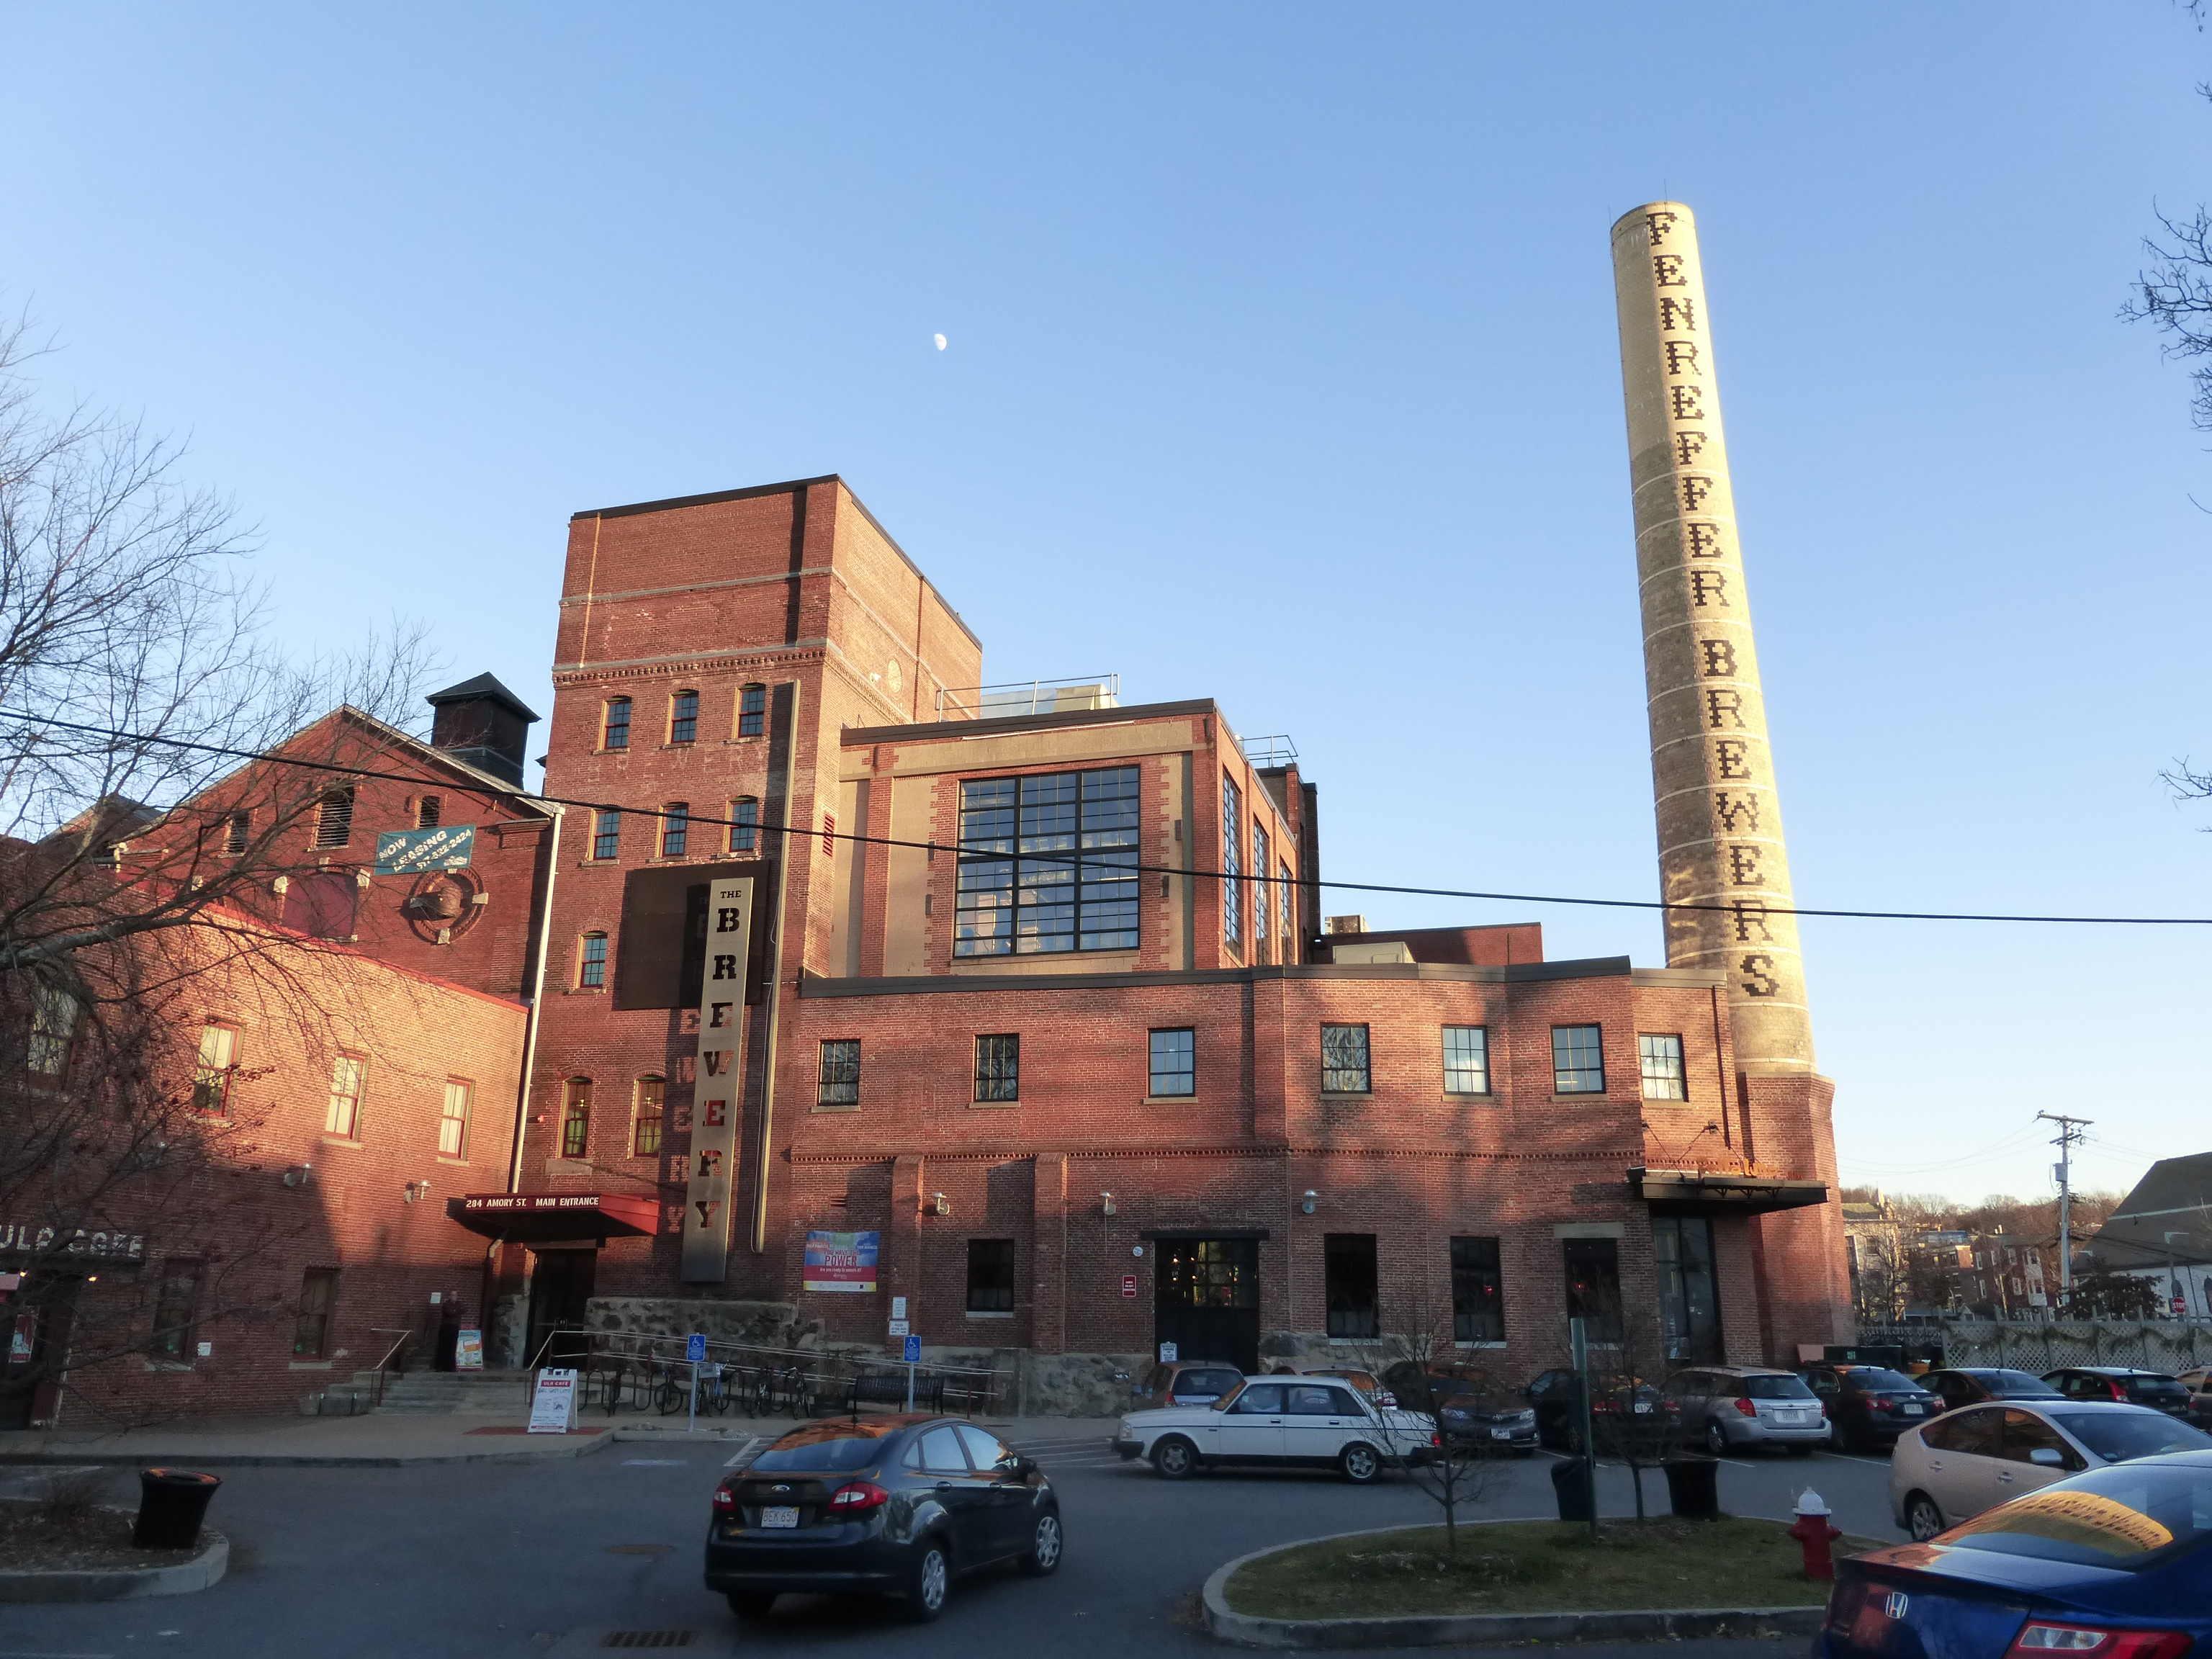 Boston Beer Company. Jamaica Plain, Boston. US. Photo: author